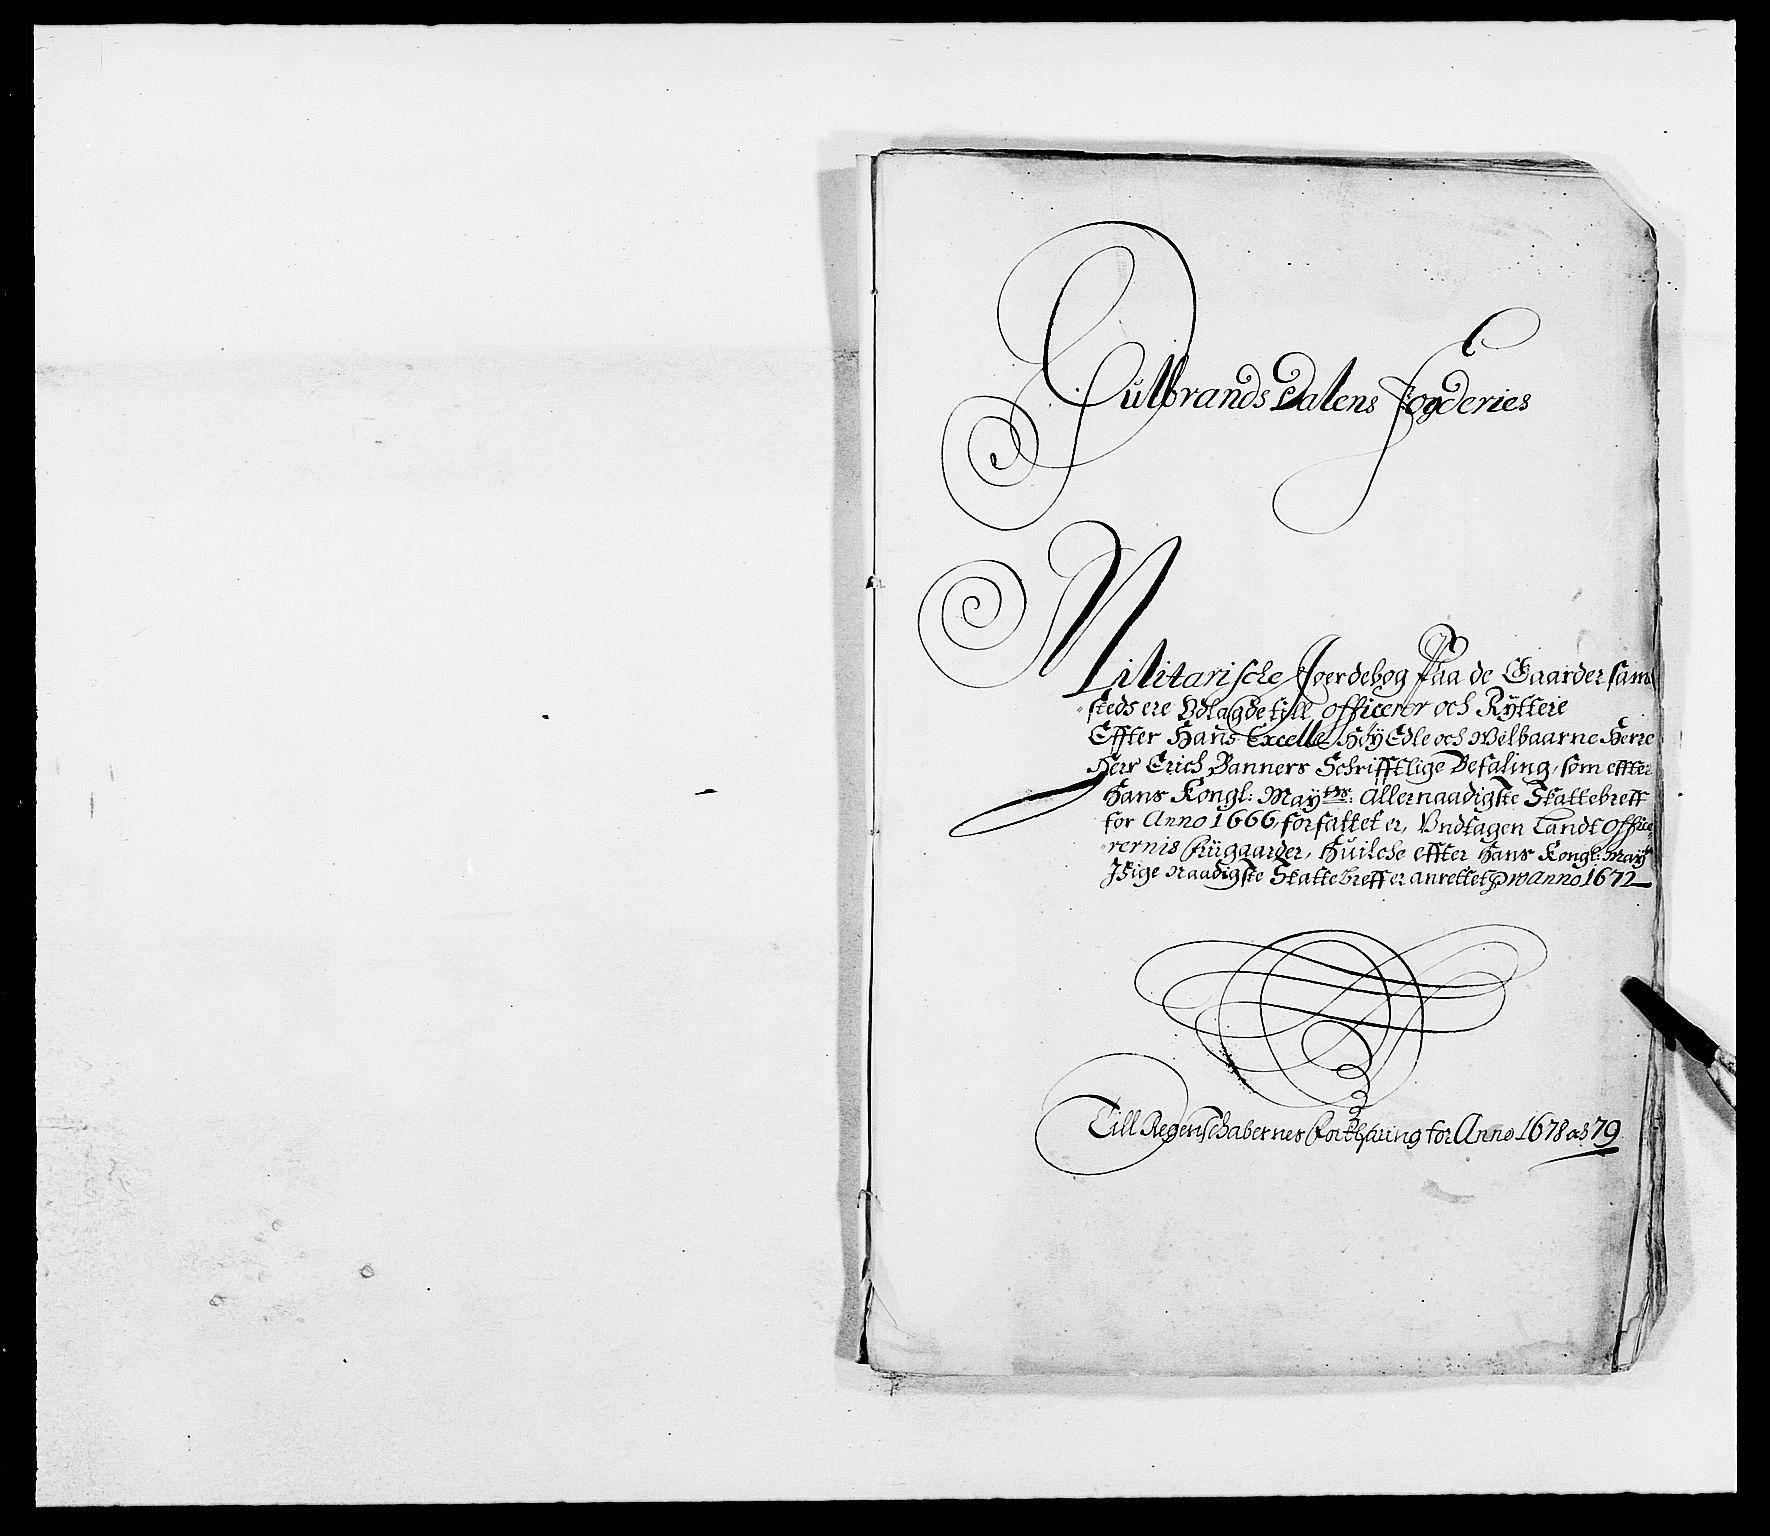 RA, Rentekammeret inntil 1814, Reviderte regnskaper, Fogderegnskap, R17/L1153: Fogderegnskap Gudbrandsdal, 1678-1679, s. 393